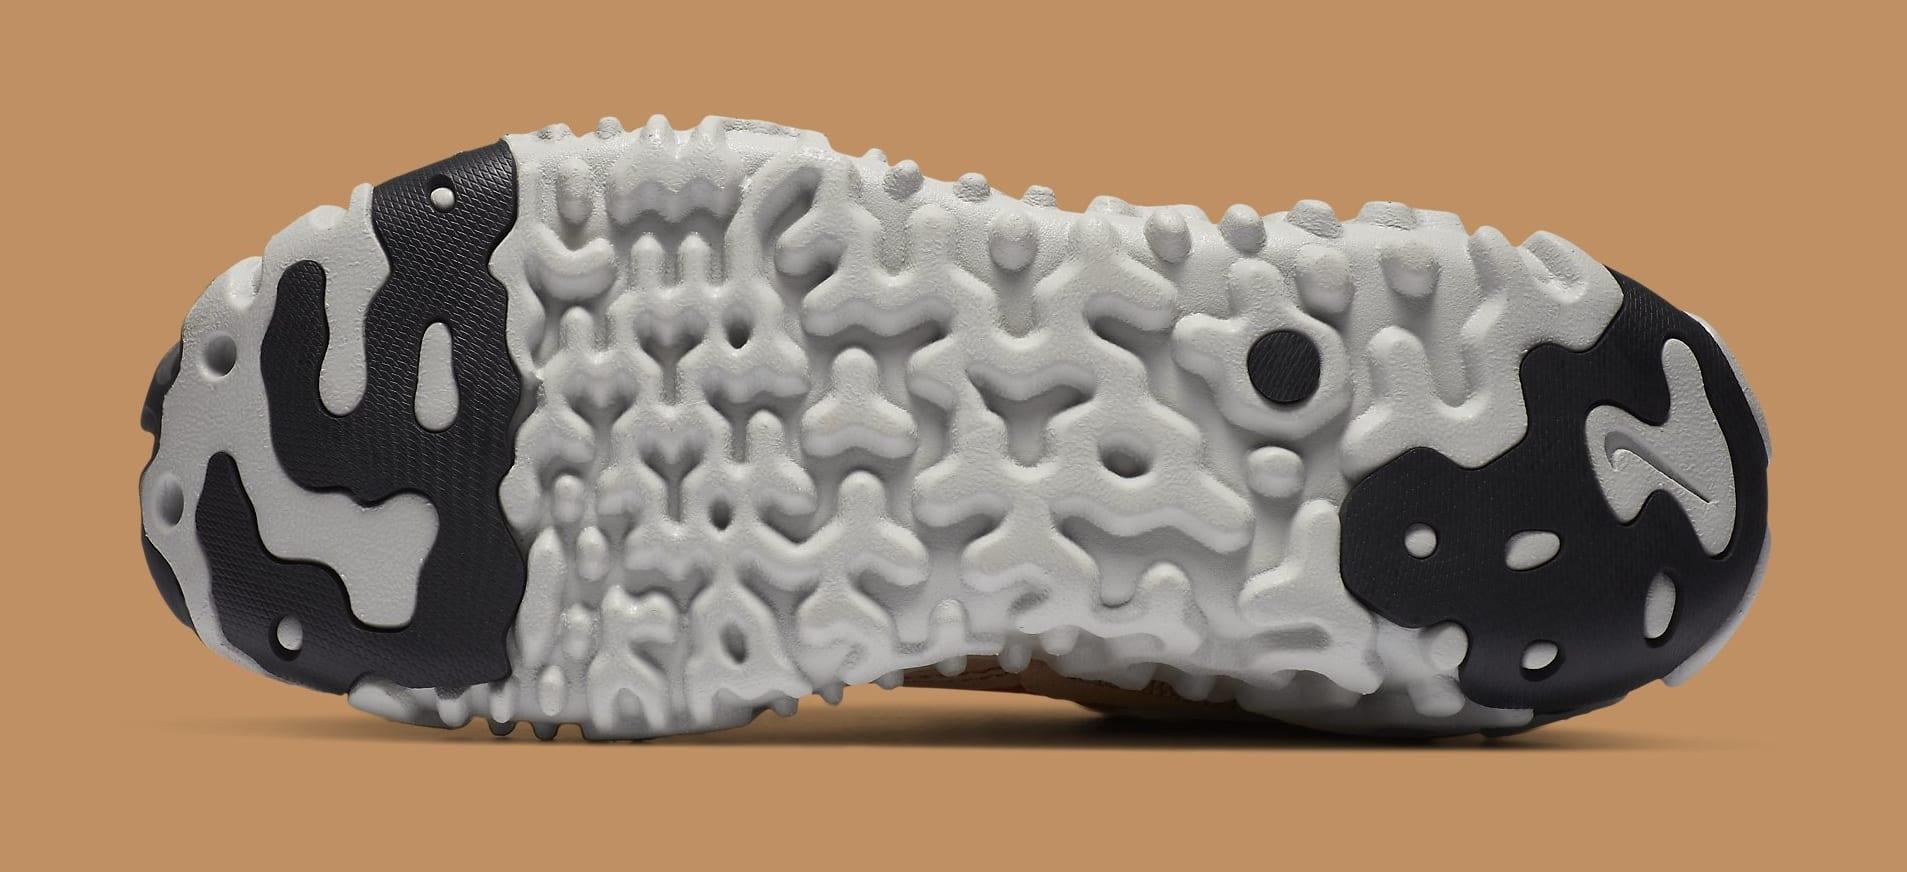 Nike OverBreak 'Mars Yard' DA9784-700 Outsole